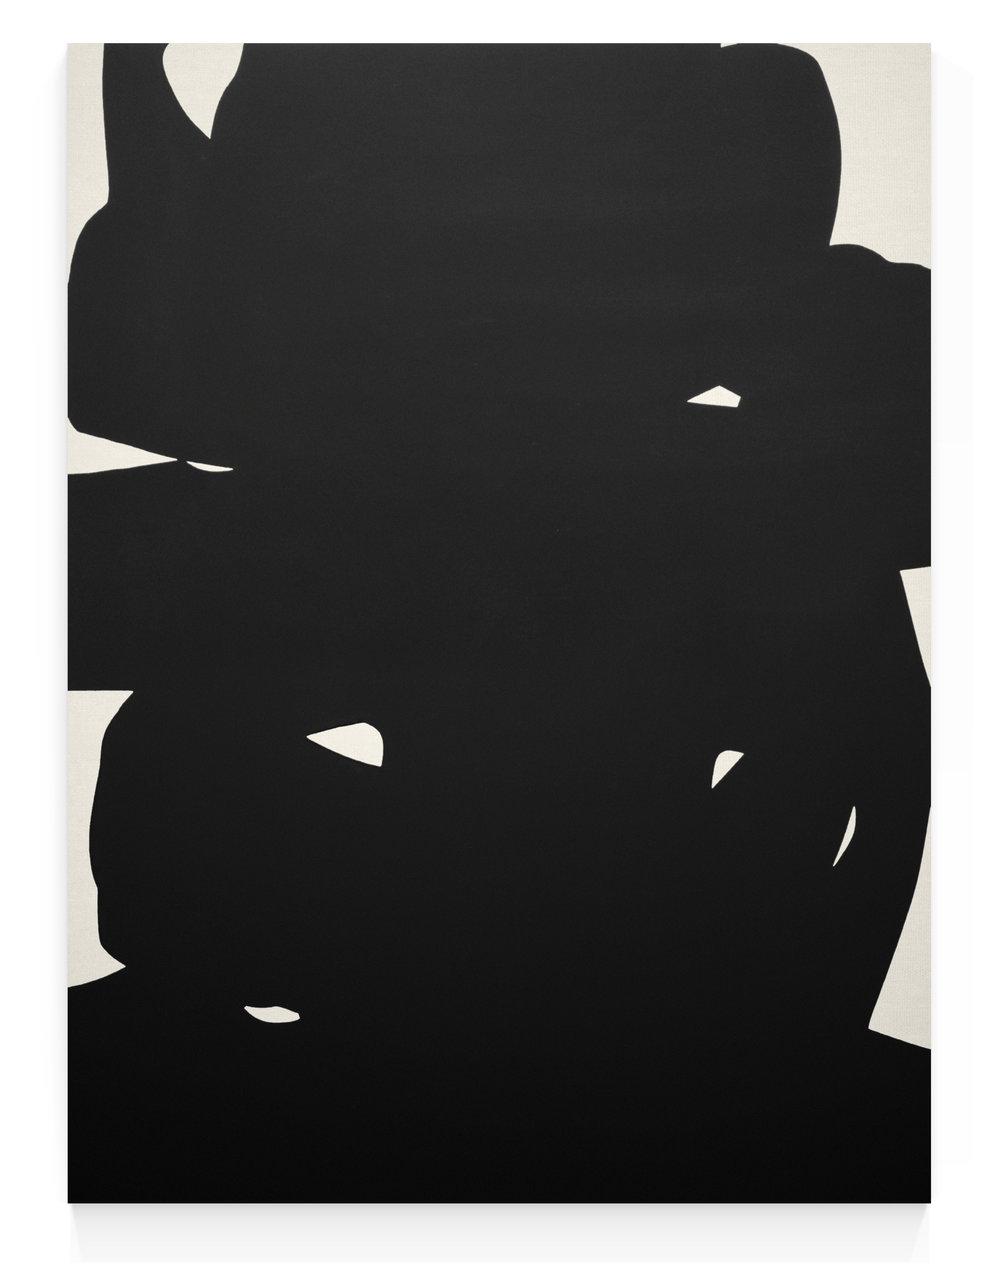 Líneas — Diego Berjon